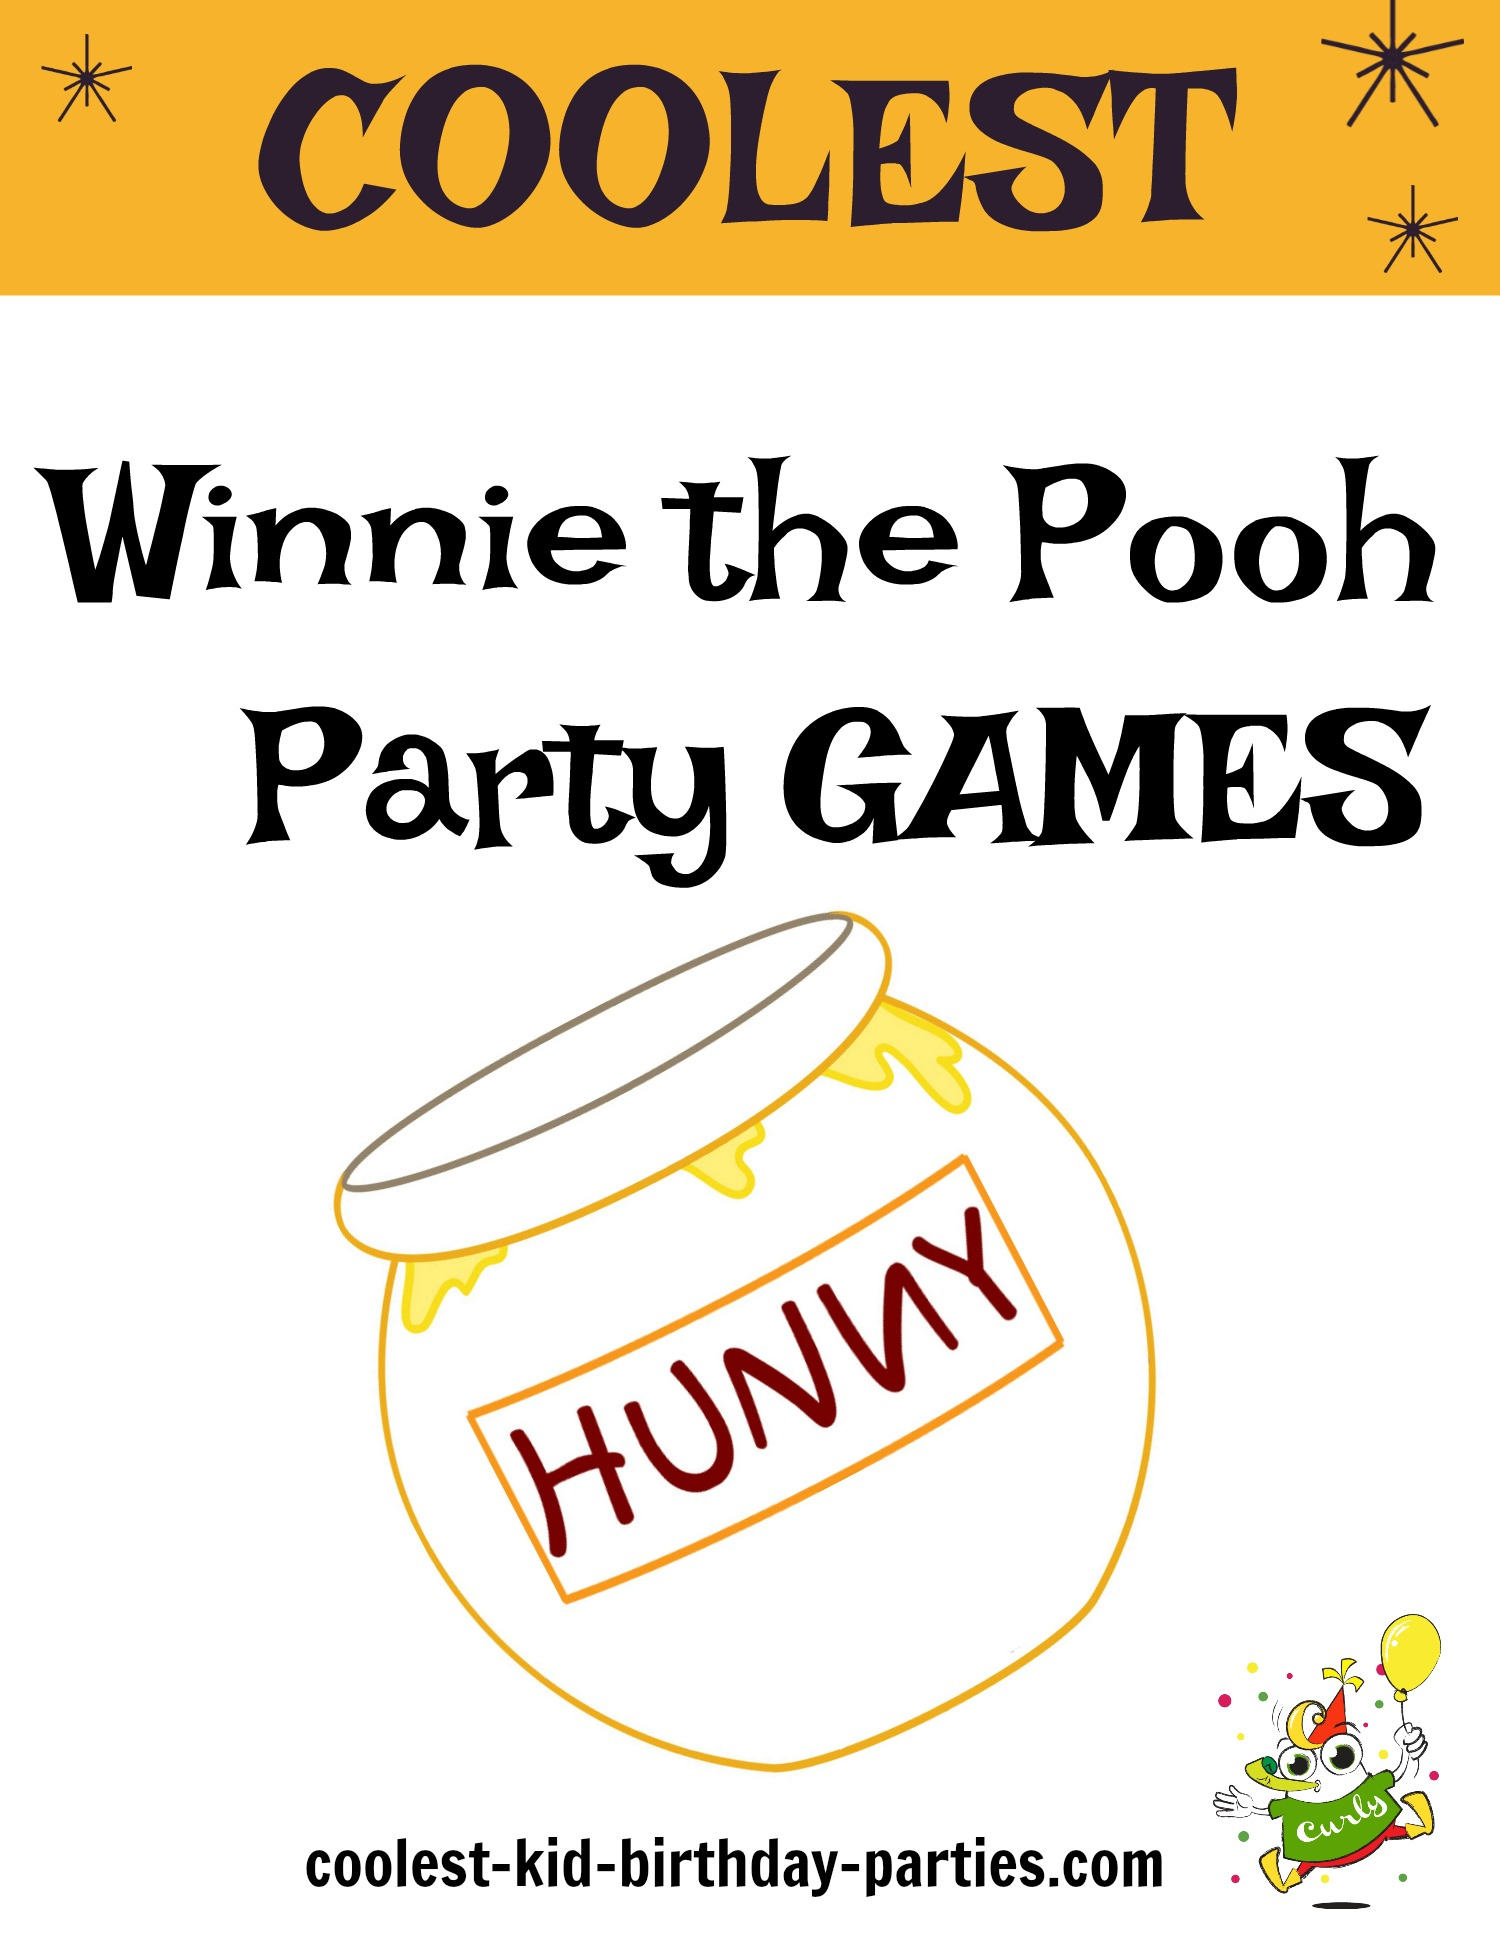 Winnie the Pooh Games